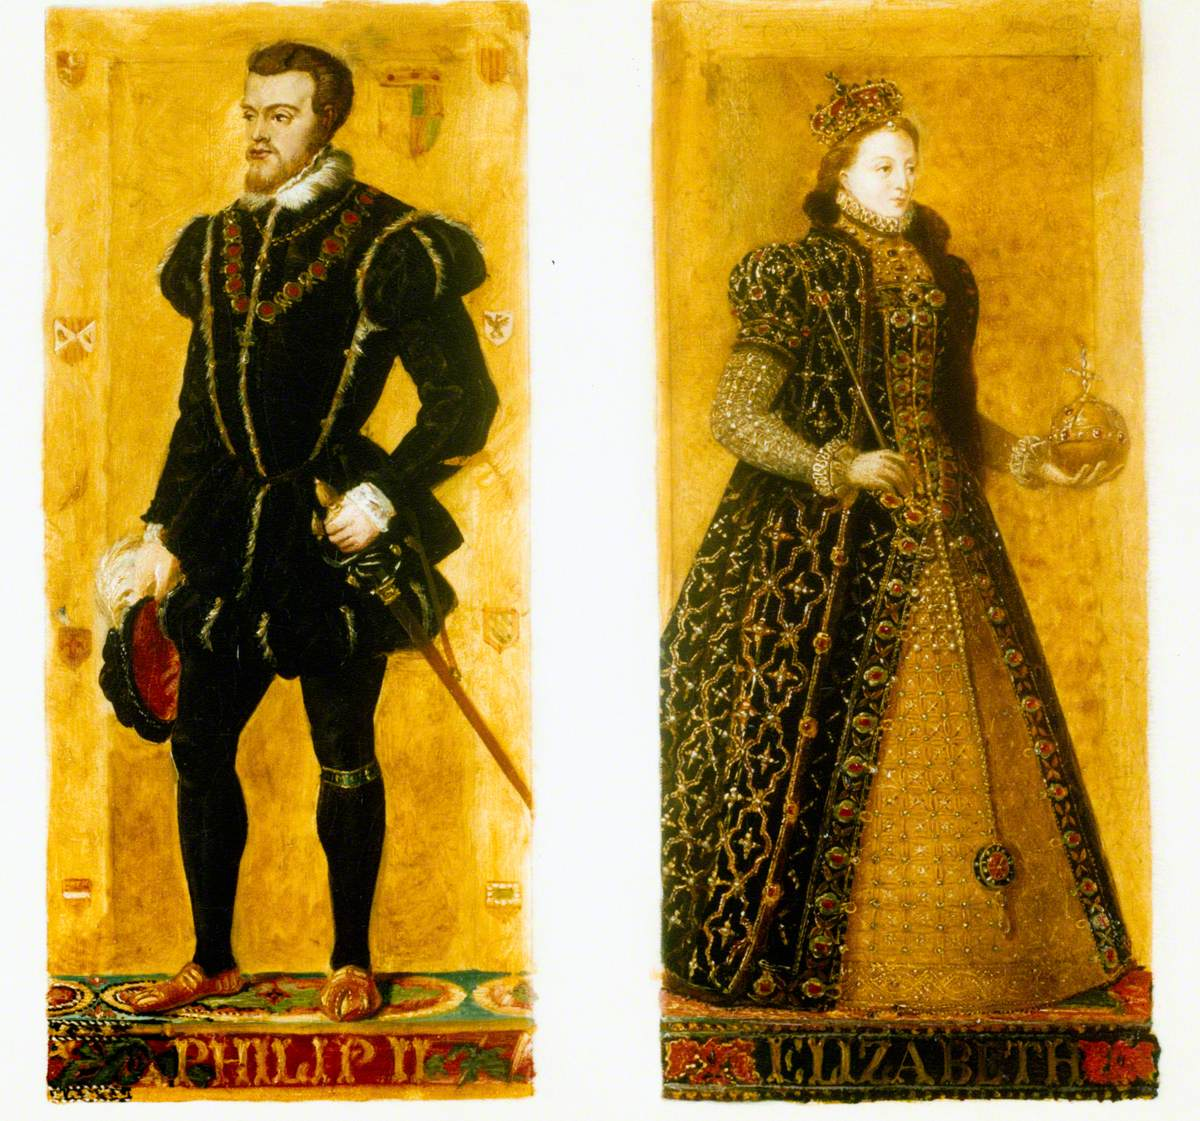 Preparatory Sketches of Phillip II of Spain and Elizabeth I